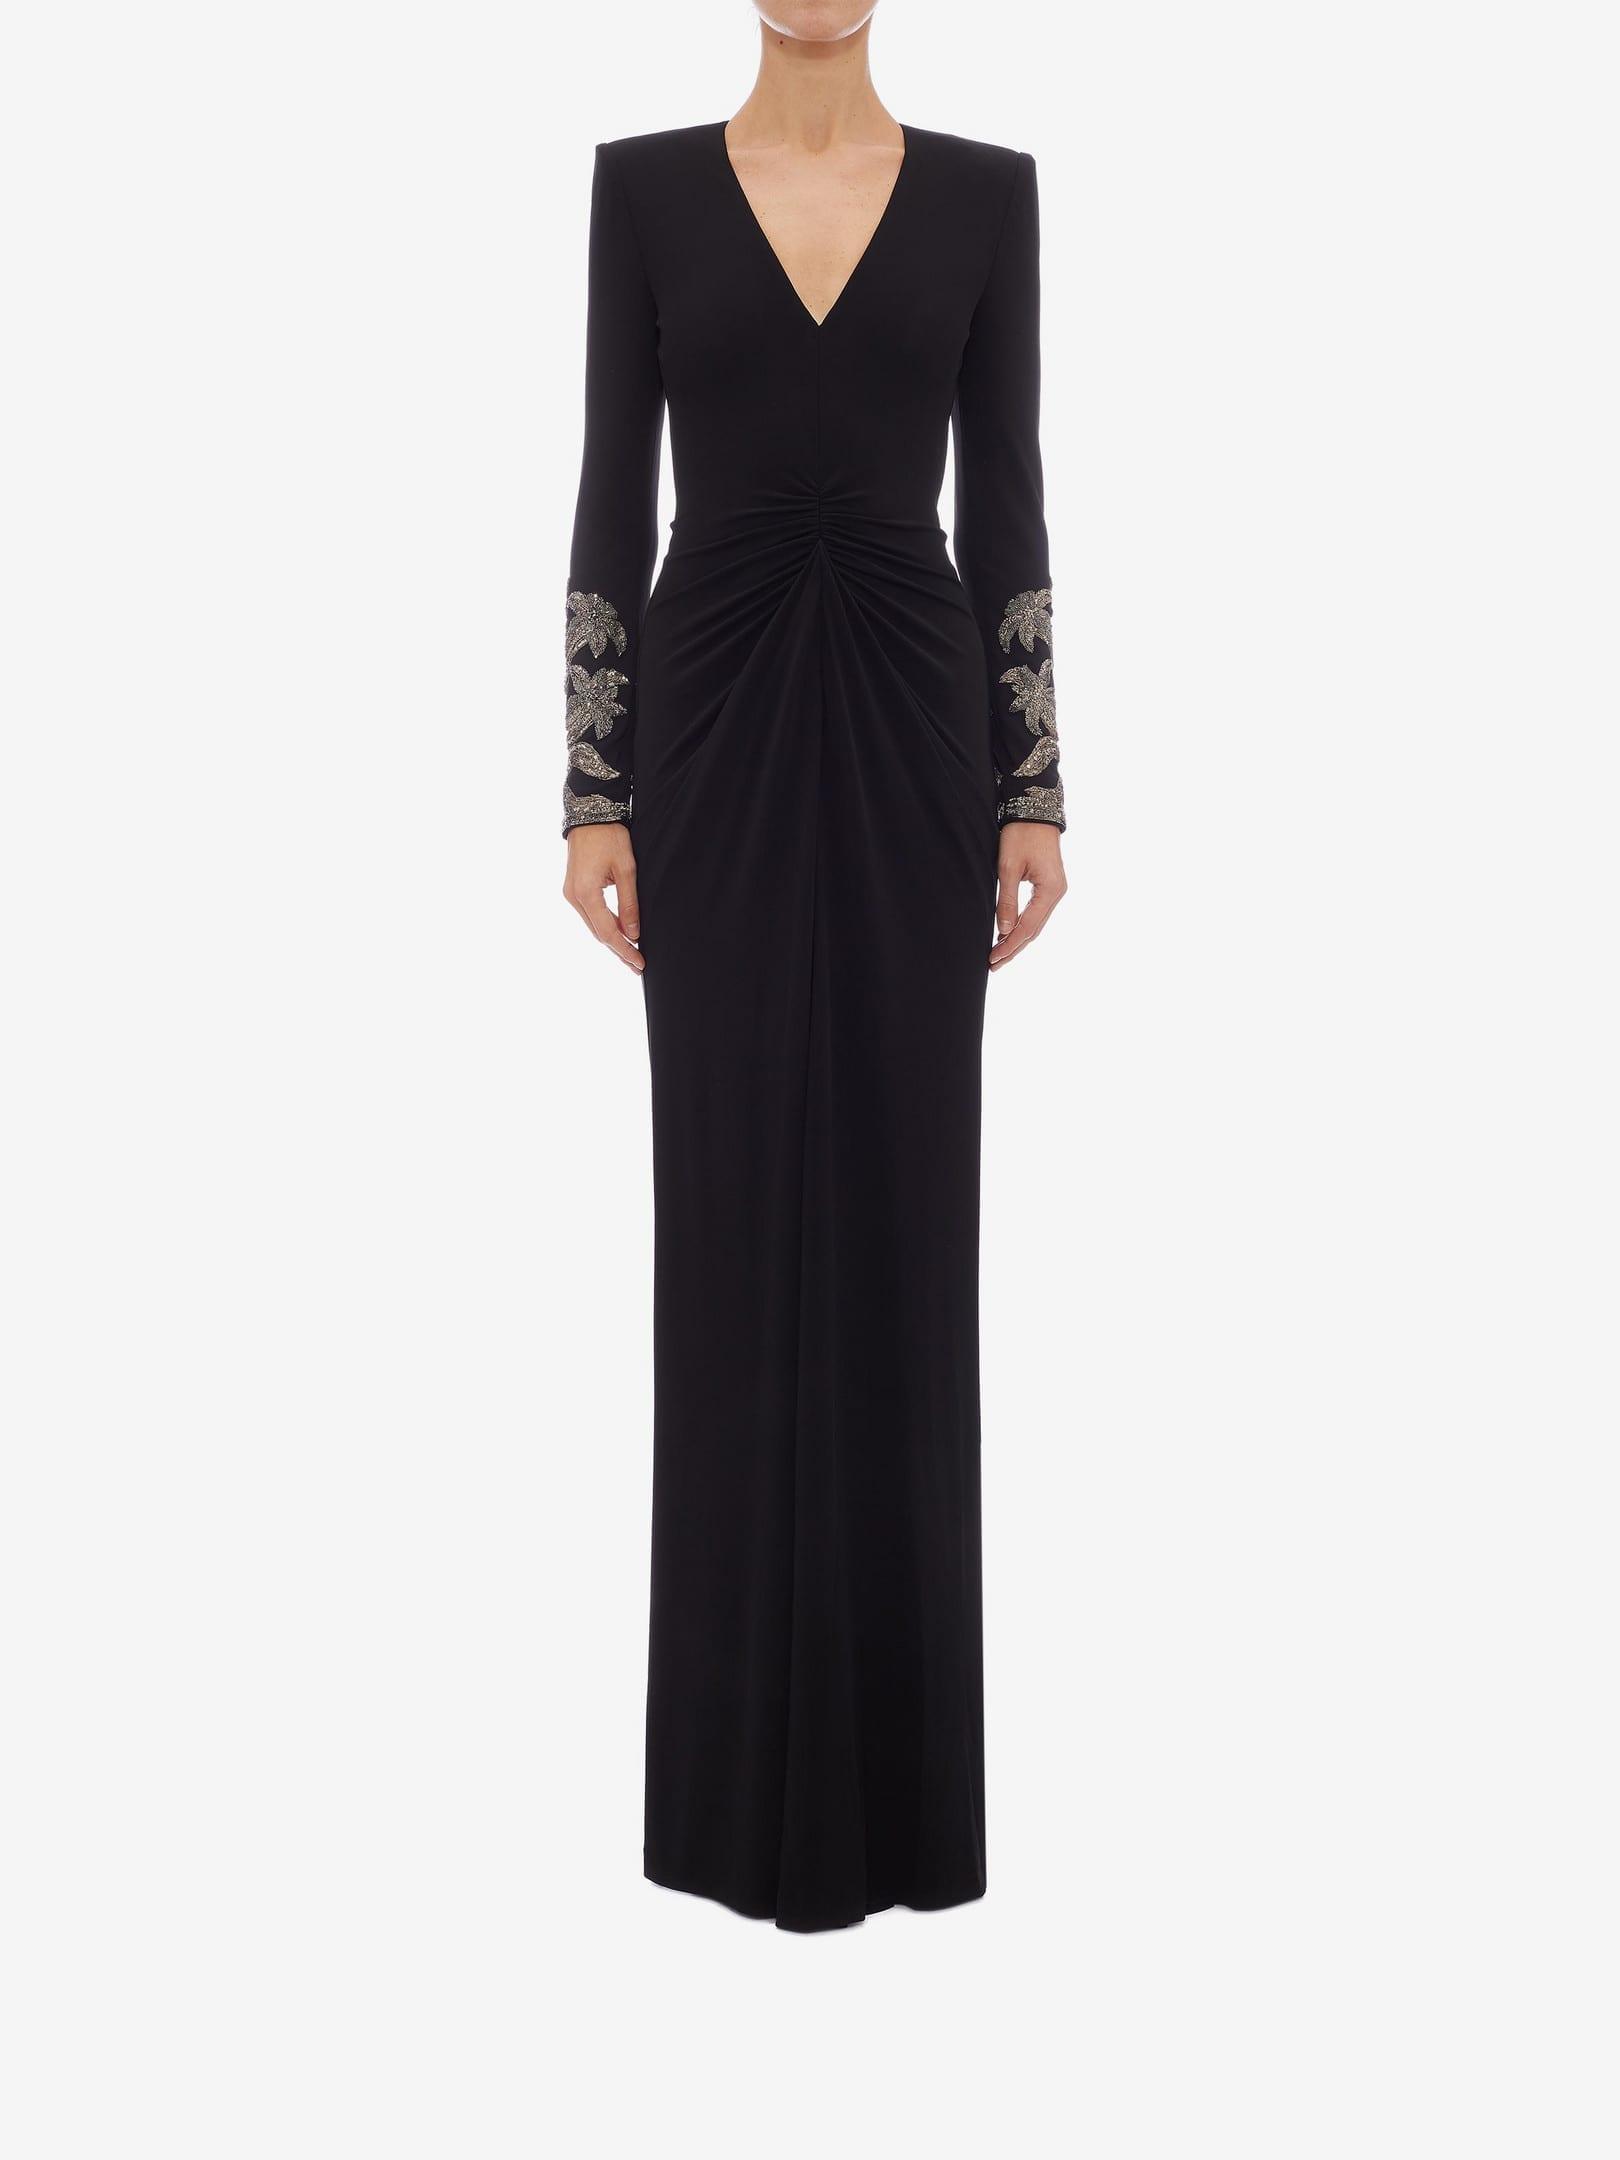 ALEXANDER MCQUEEN Embroidered Evening Black Dress - We ...